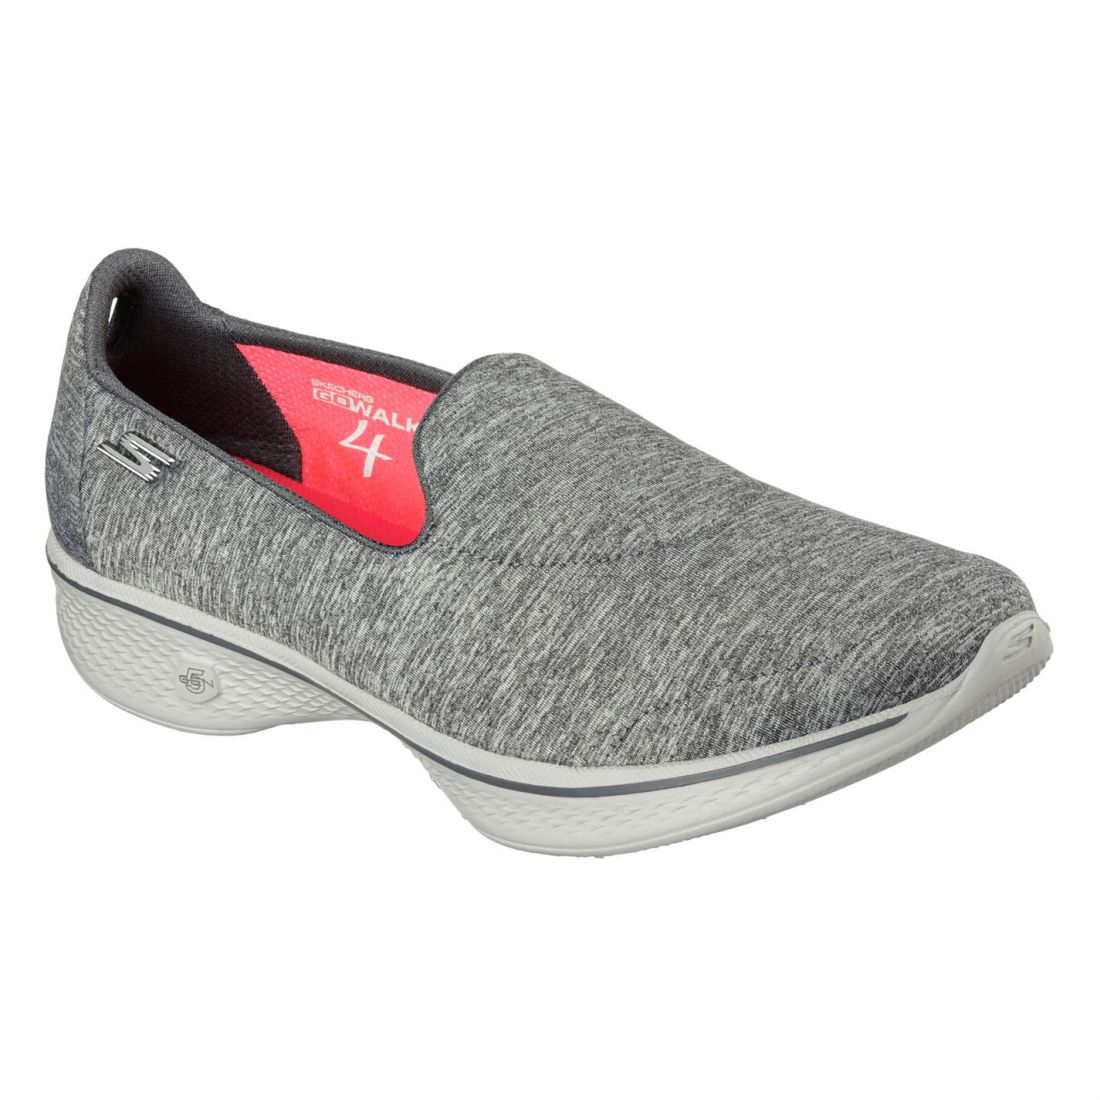 Zapatillas Heather Gowalk Skechers 4 Zapatillas Jersey anttimicrobianas damas gris para Achiever vrvqWnH